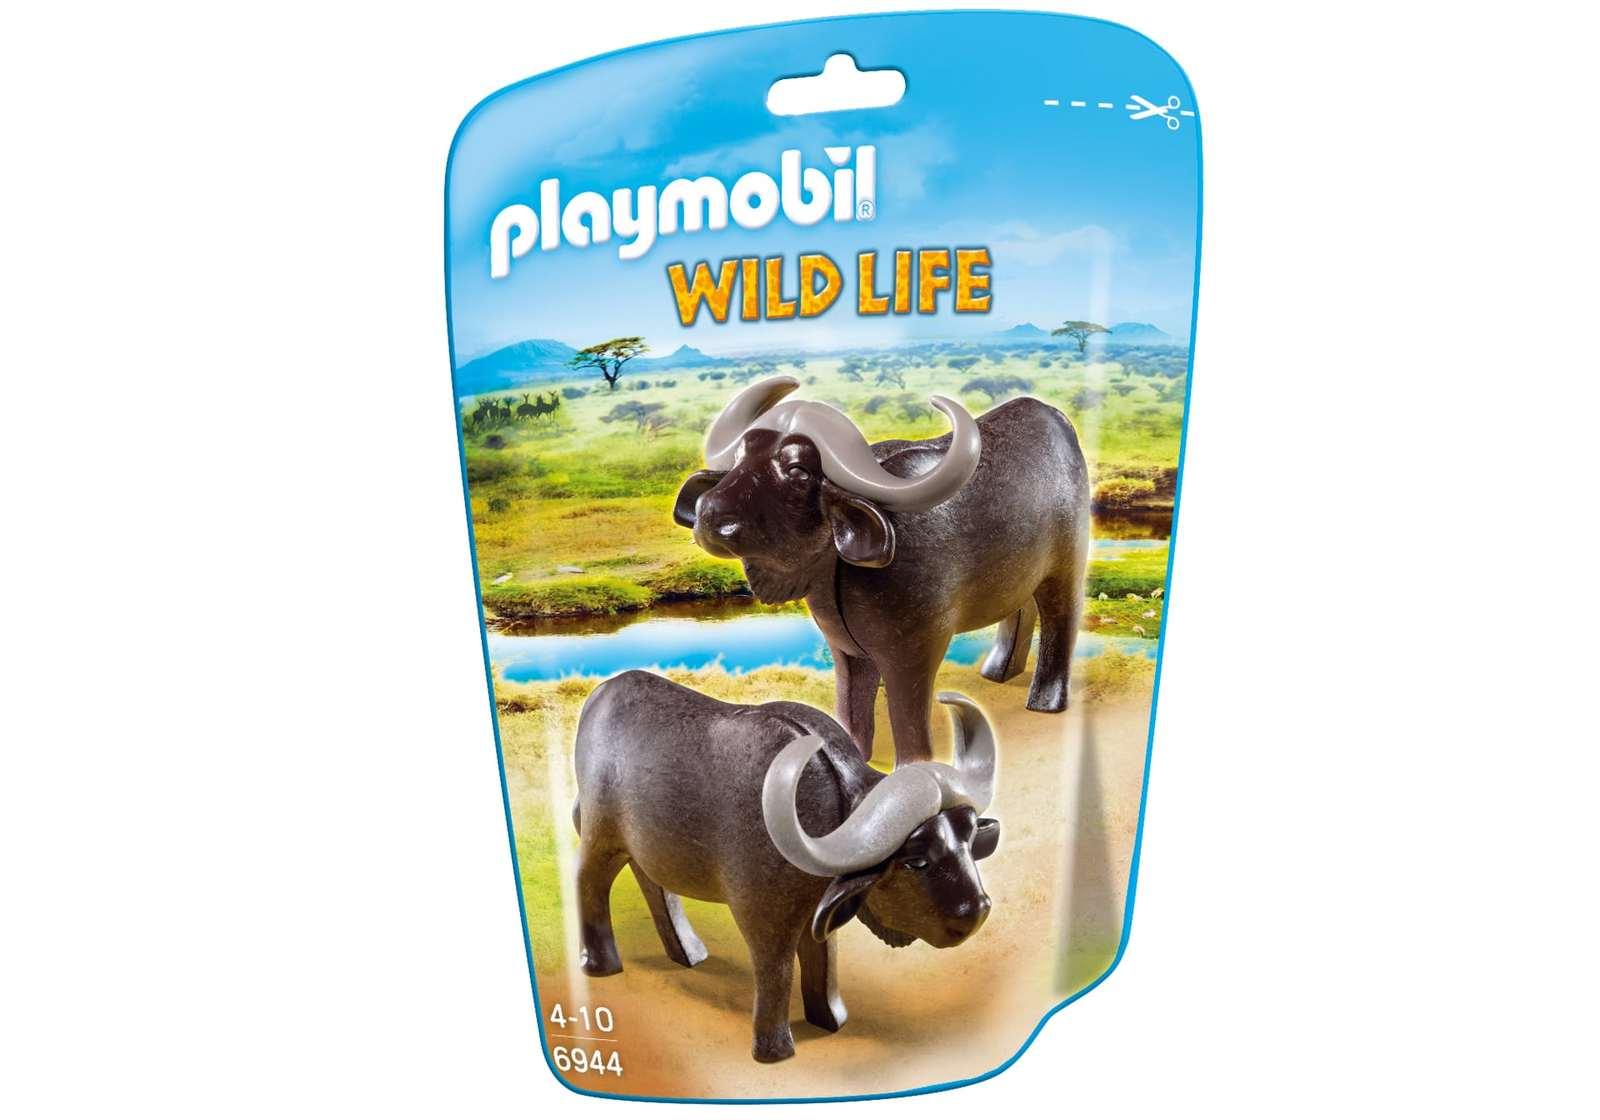 Playmobil: Wildlife - Water Buffaloes image